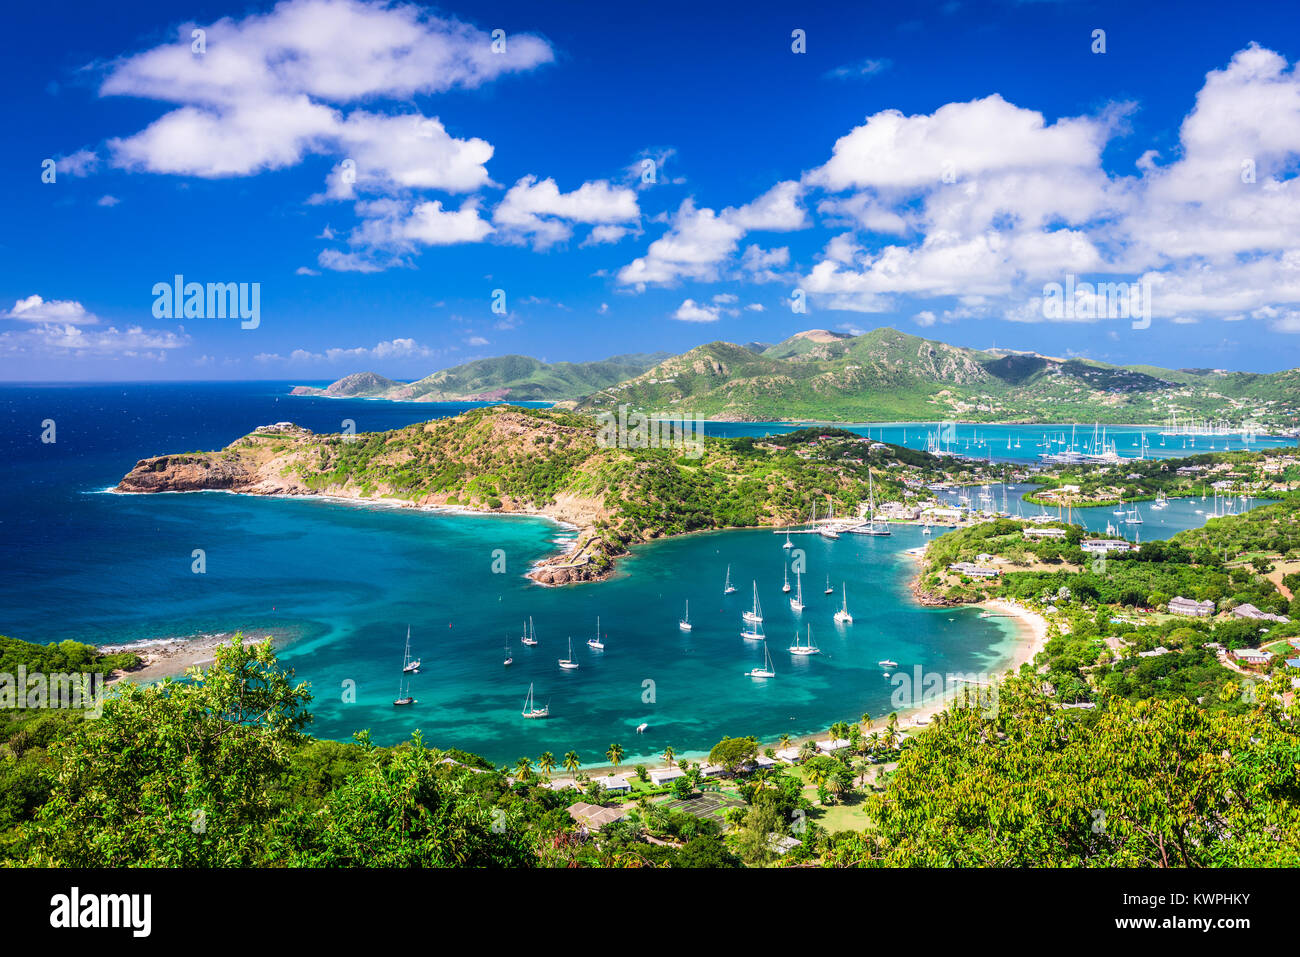 Shirley Heights, Antigua view. - Stock Image